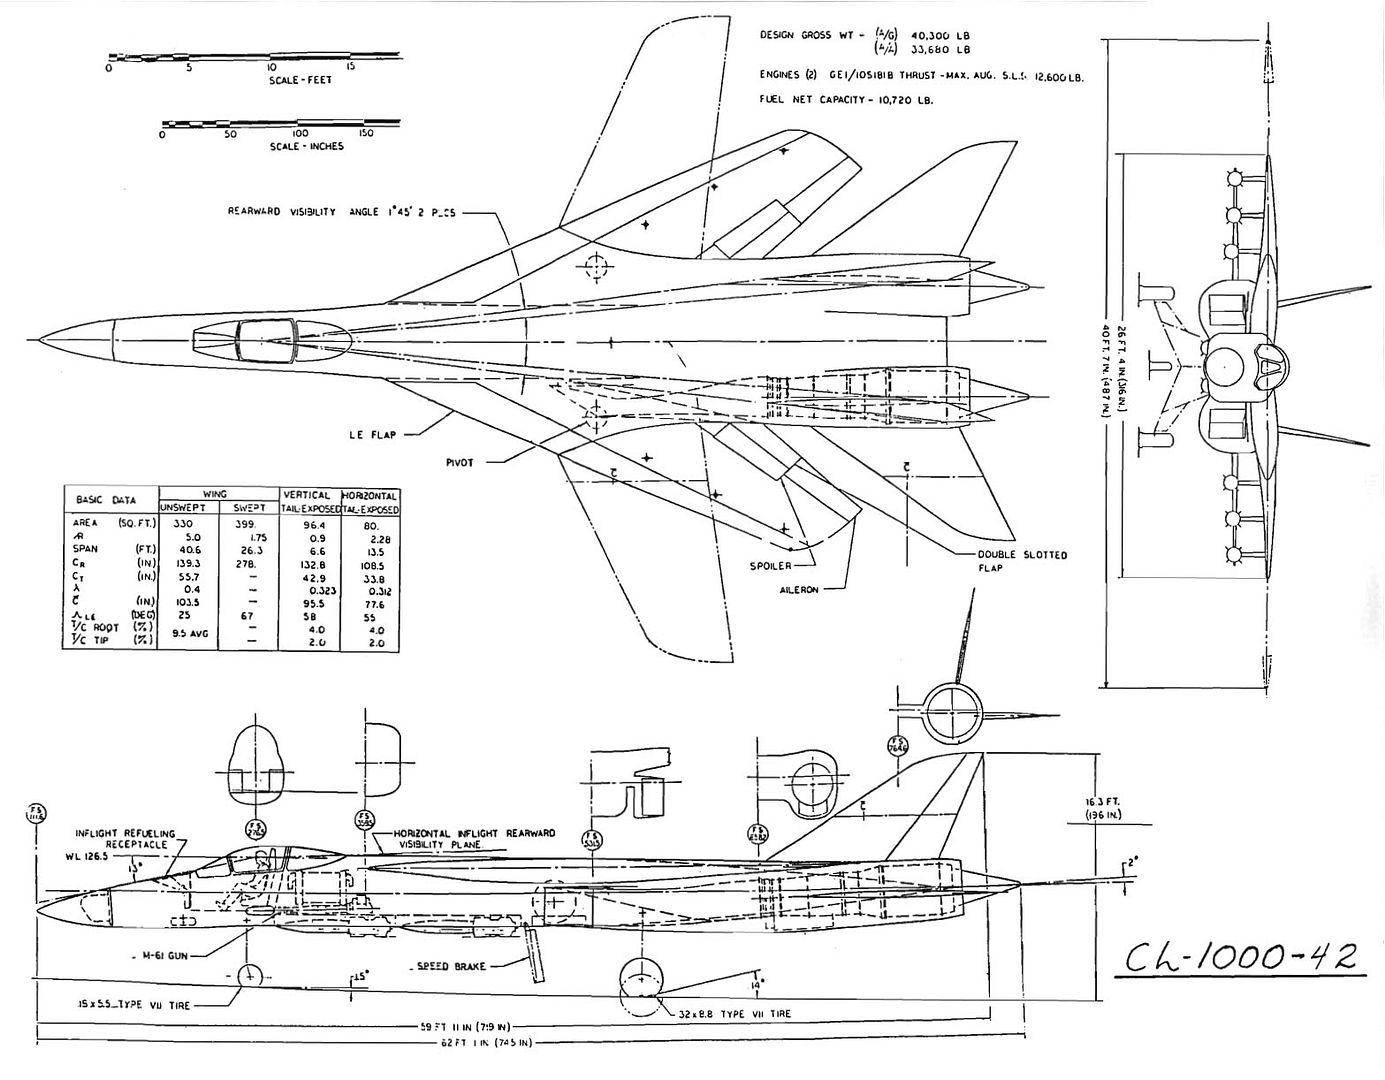 LockheedCL-1000-42_zps19bb4dfb.jpg